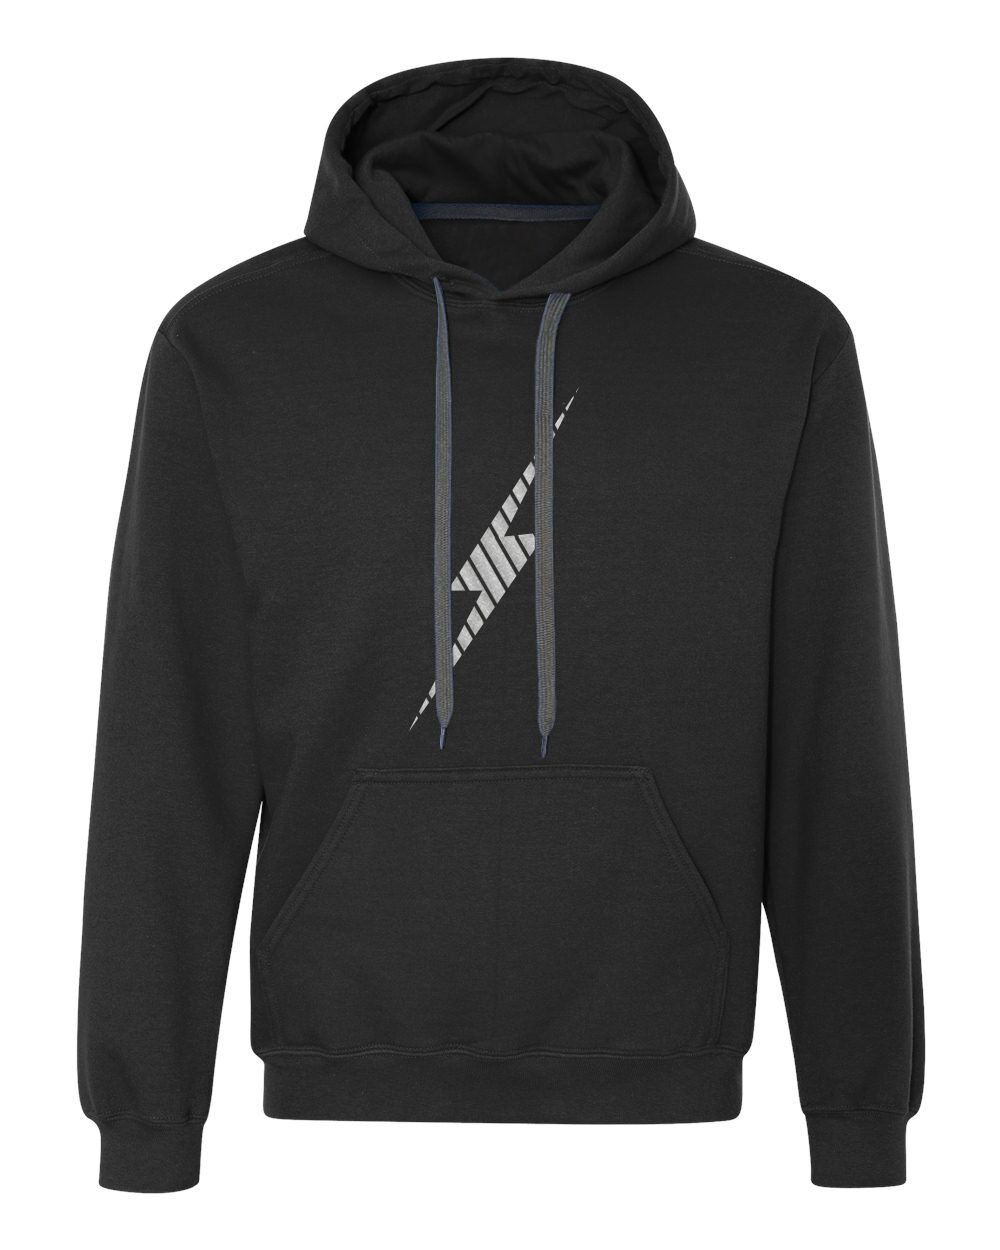 hoodie-lighting-bolt-segmenta-front-.jpeg